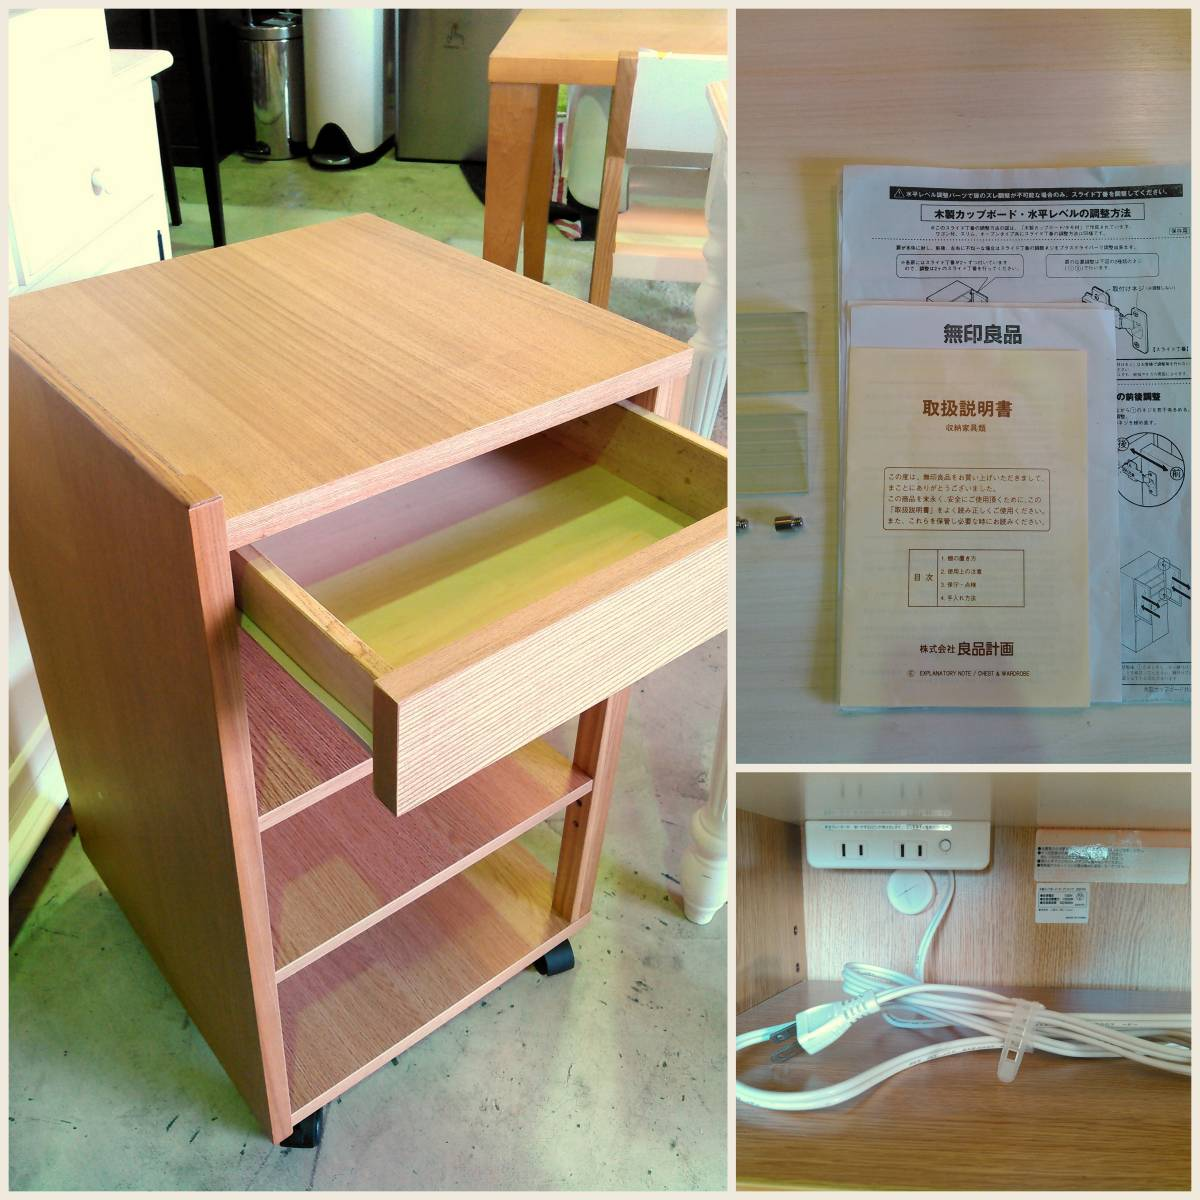 ■MUJI無印良品■ 木製カップボード オープンタイプ タモ材/ナチュラル ワゴン付き 食器棚 カップボード キッチンボード_画像3